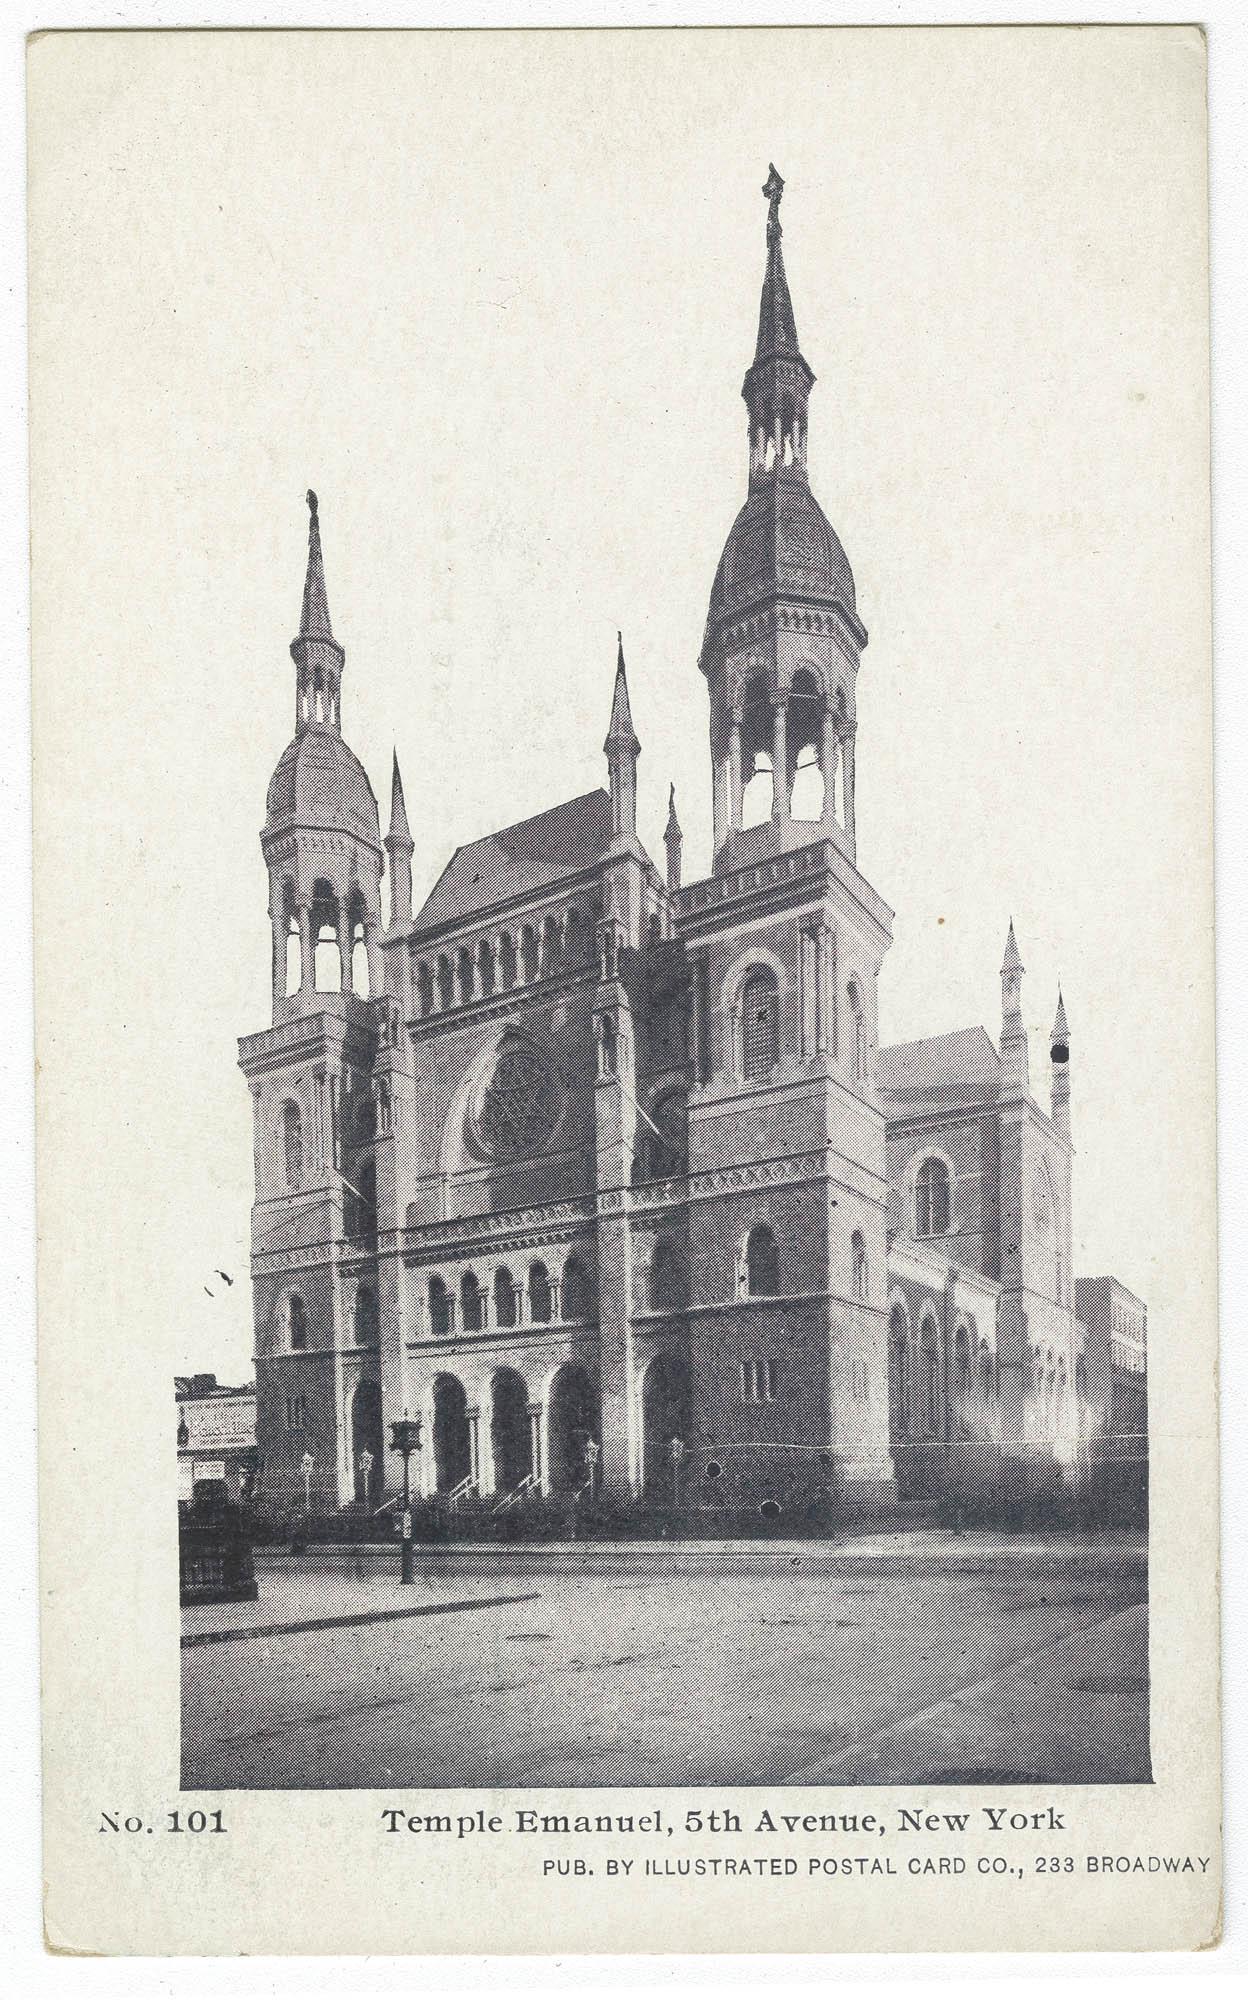 Temple Emanuel, 5th Avenue, New York